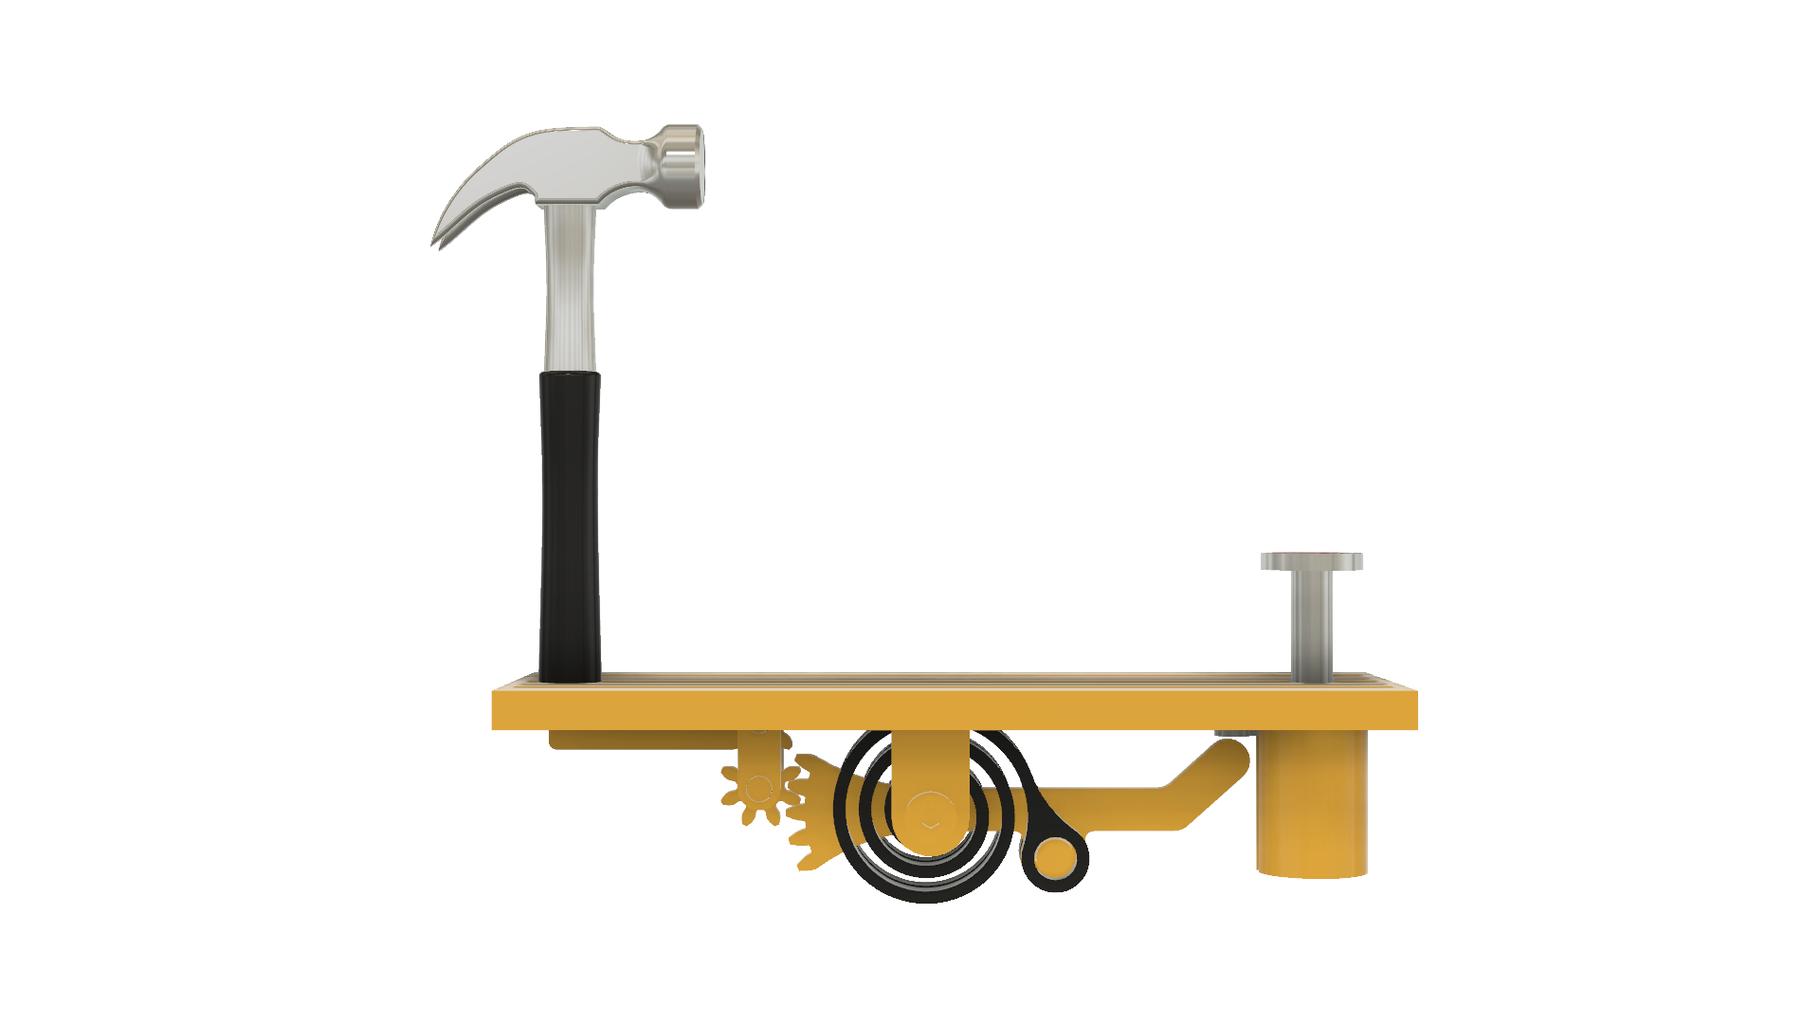 Add Gear Idler, Gear Hammer, Hammer and the Base.